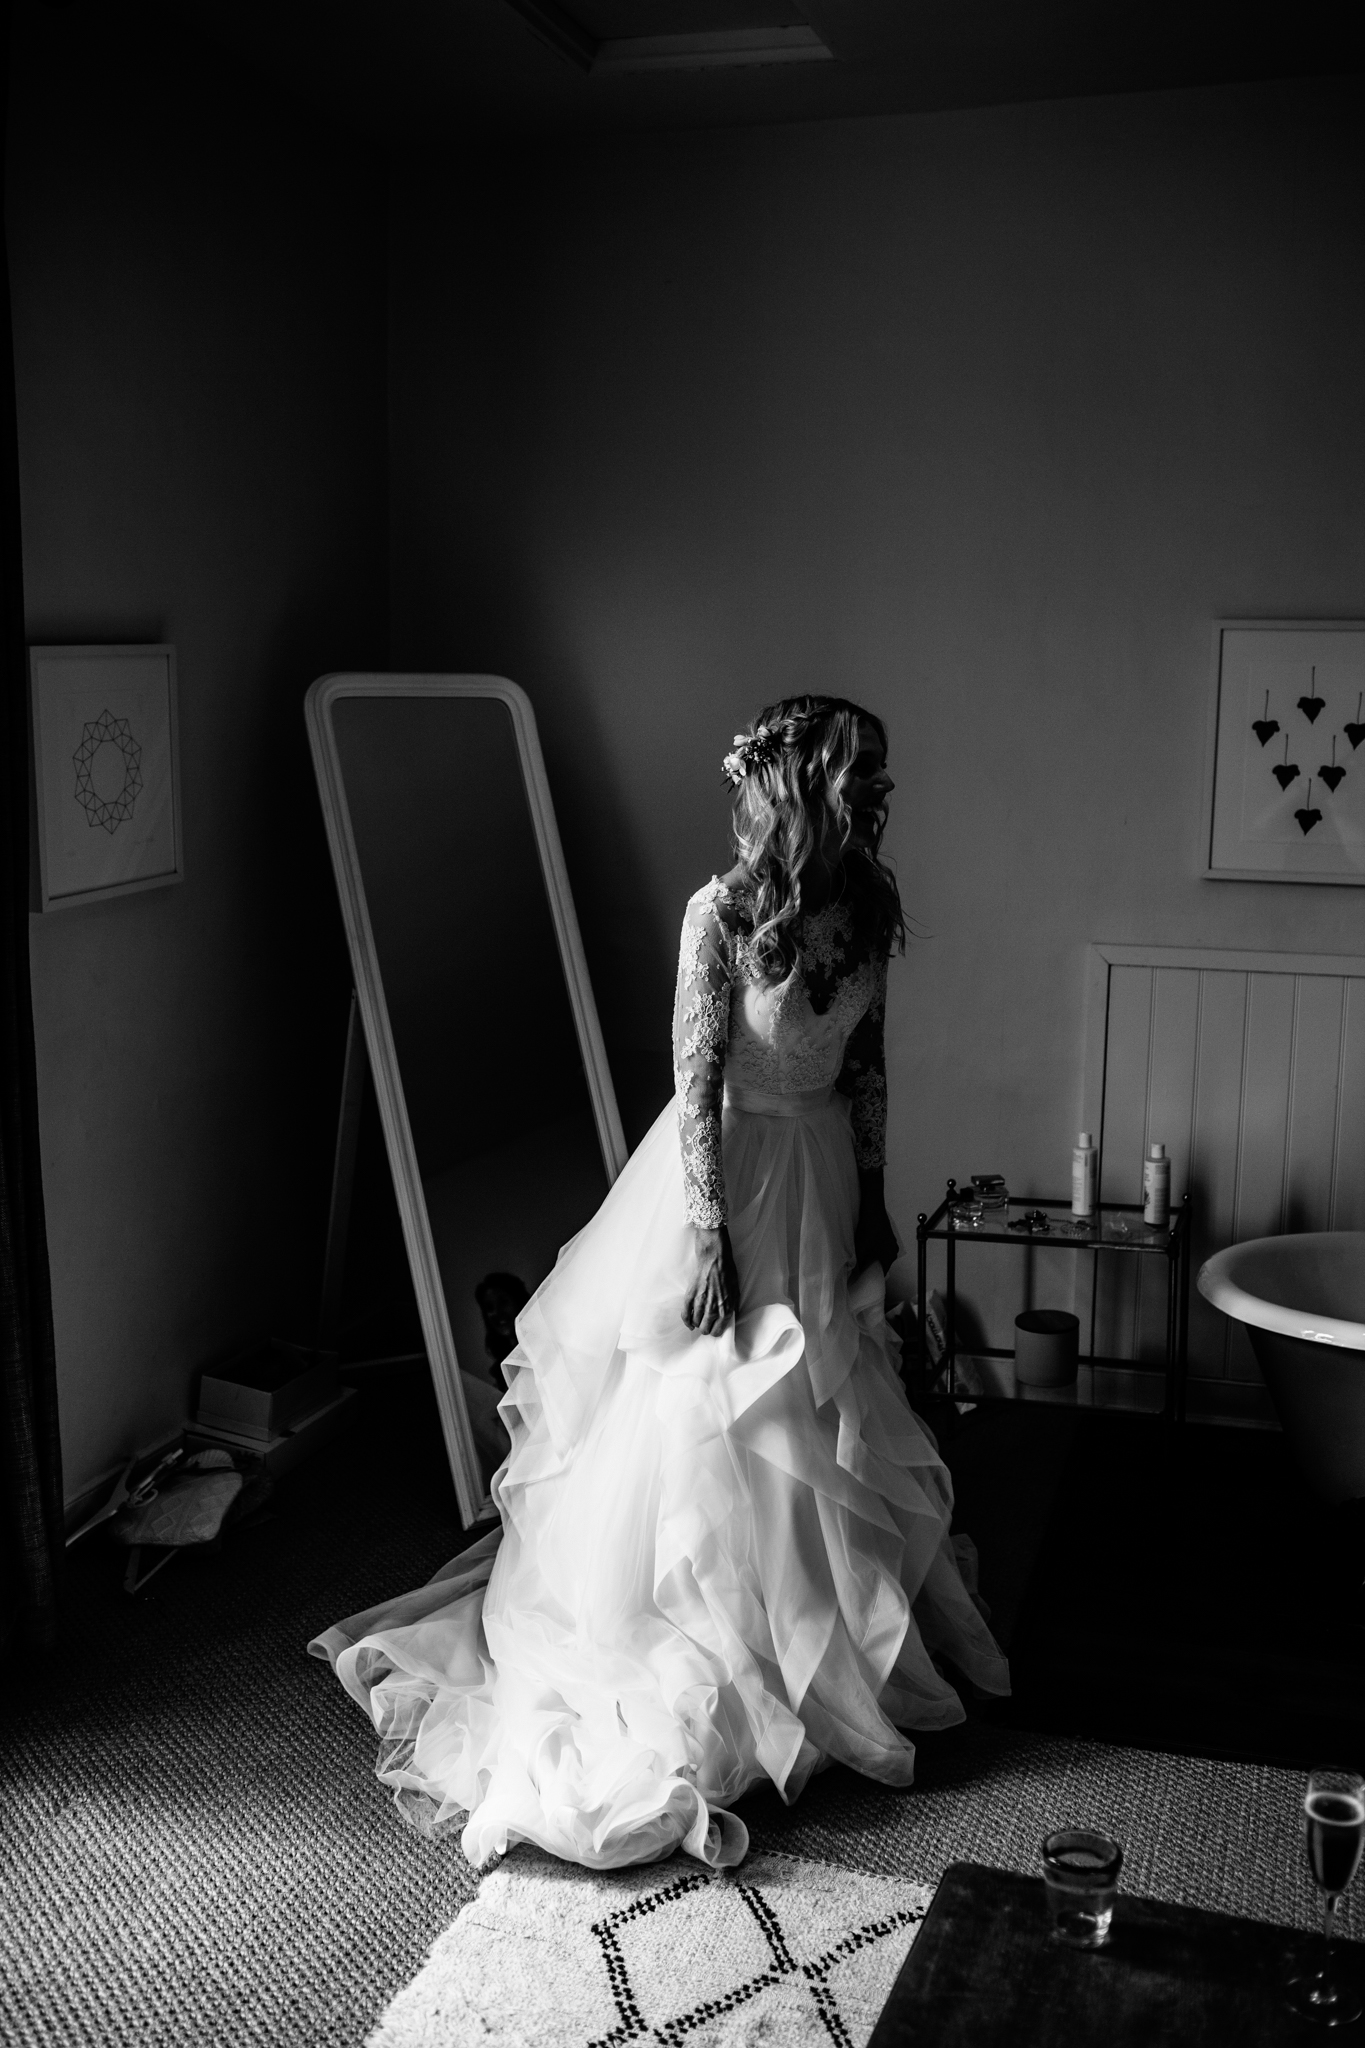 black and white bridal portrait at the Talbot inn at Mells